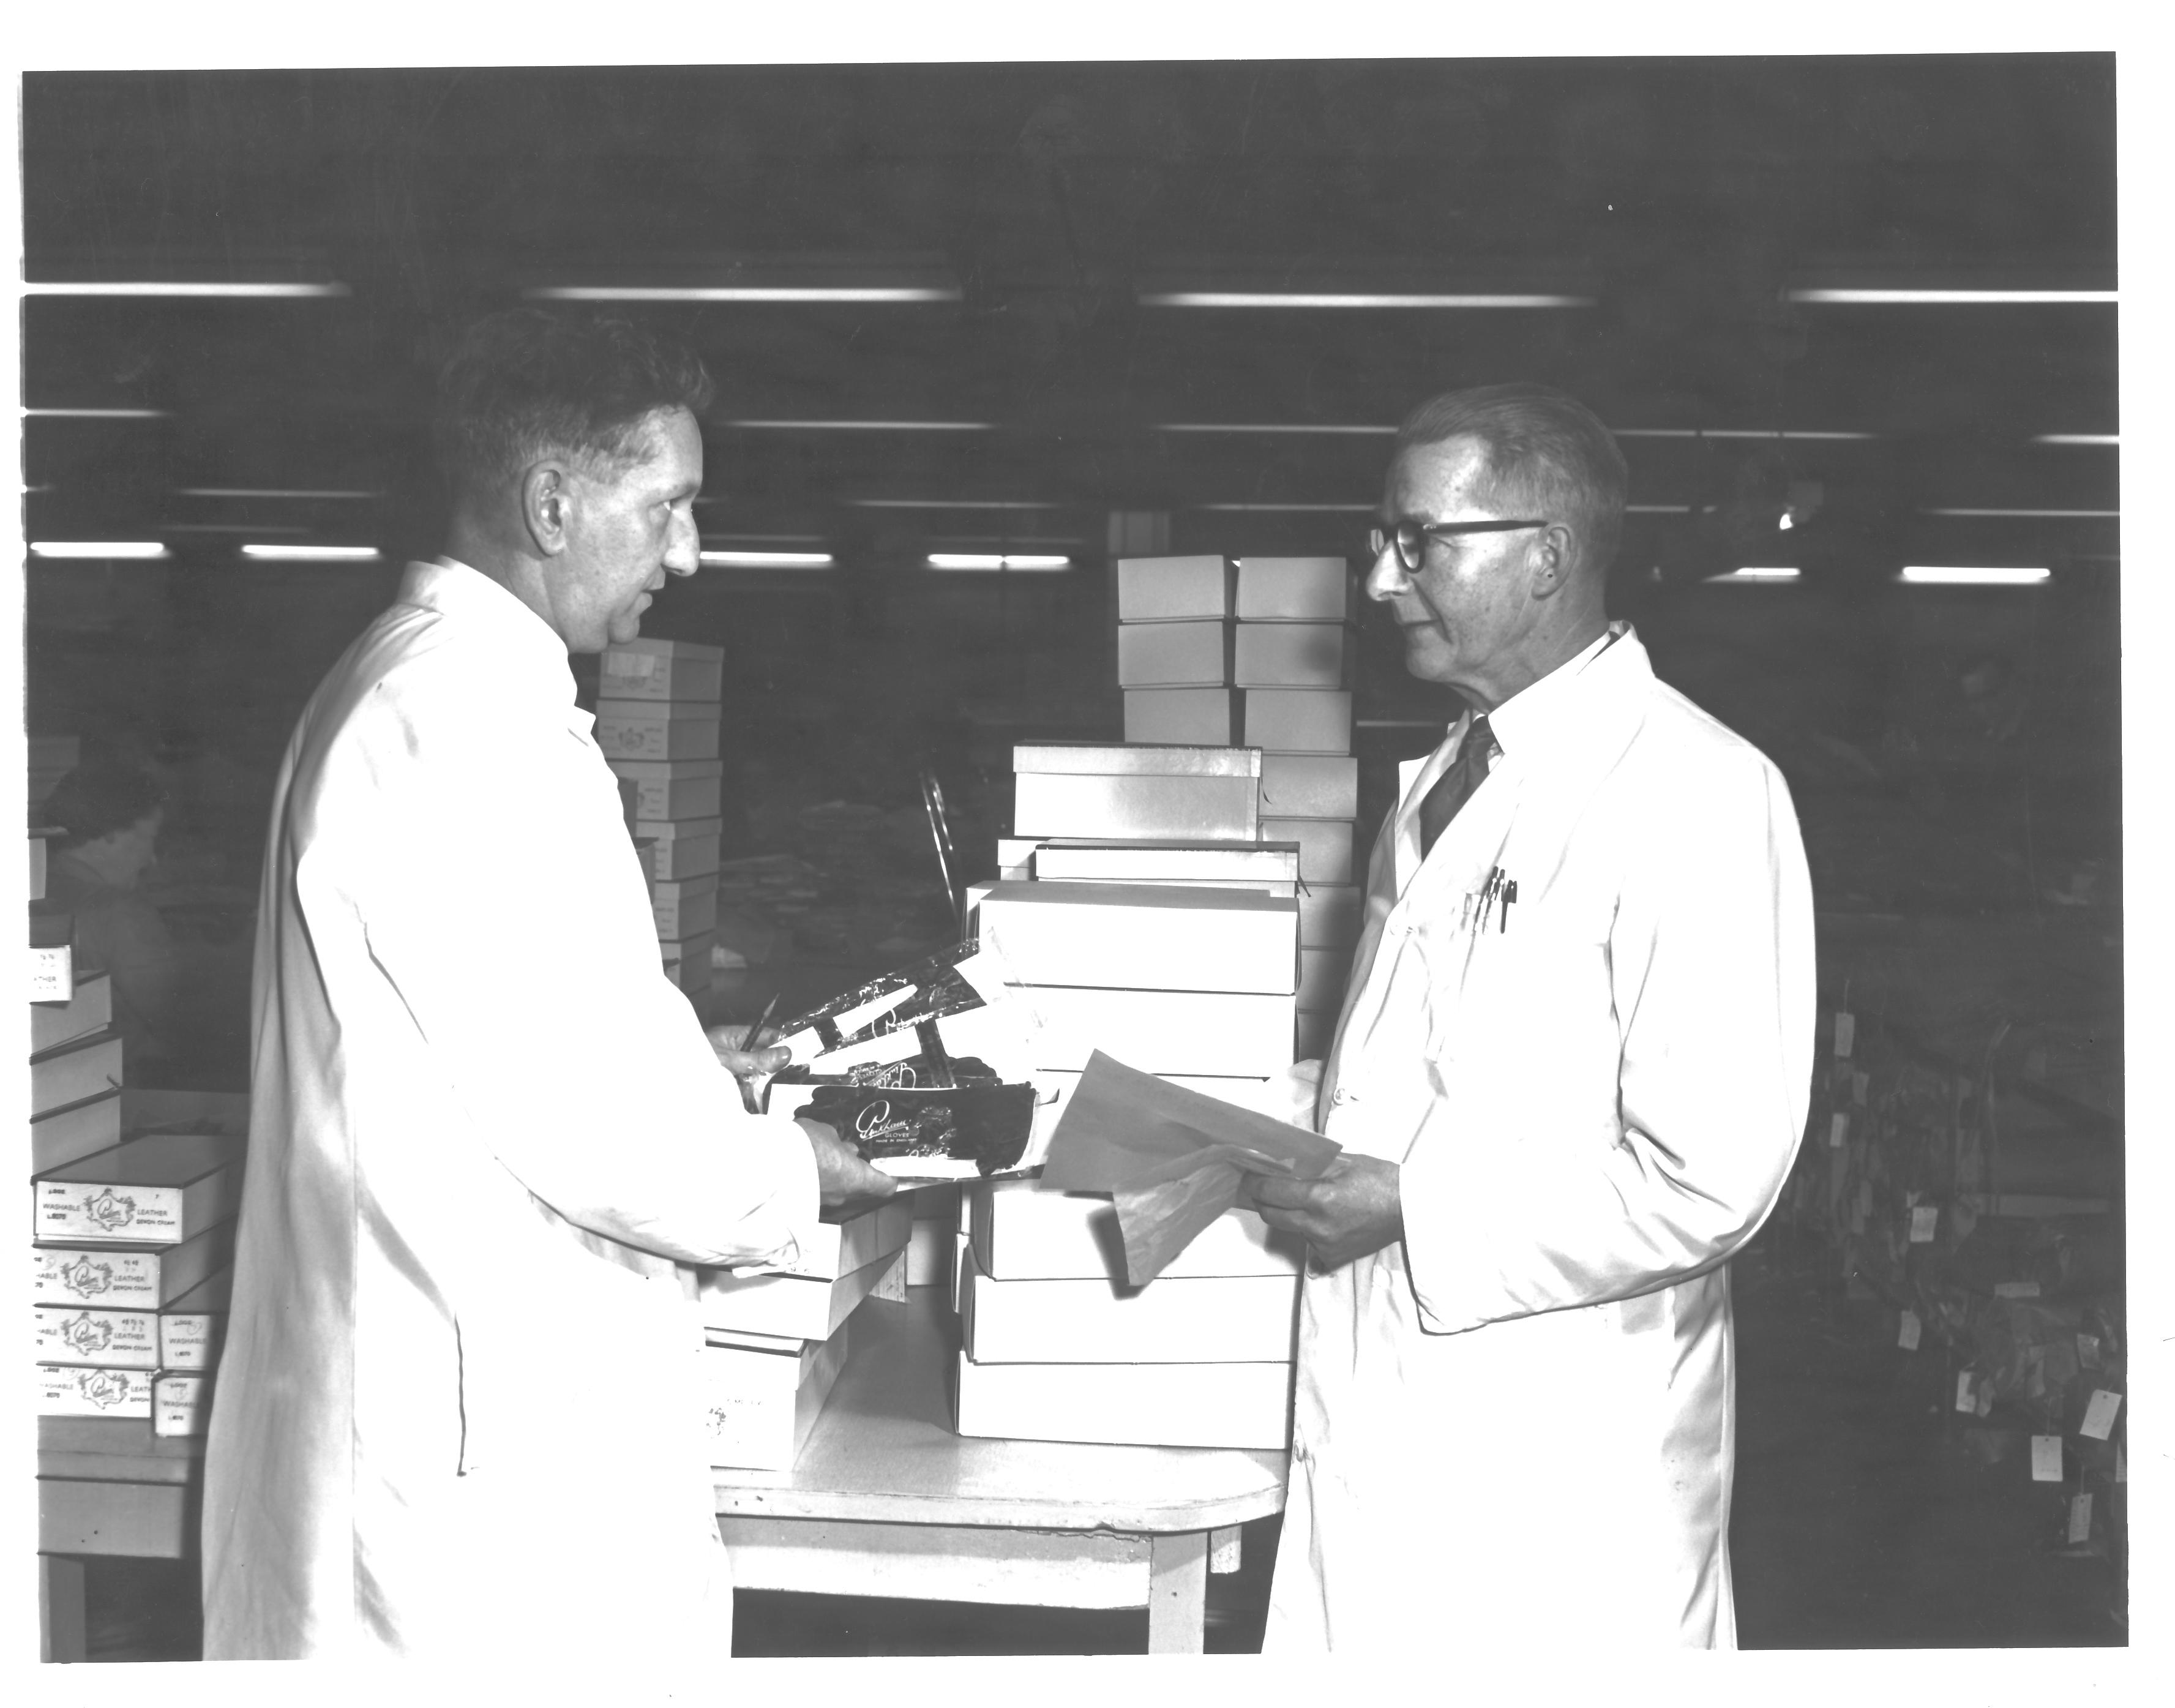 m0423-Herbert-Keeble-rt-and-John-Scott-and-Pinkhams-glove-factory